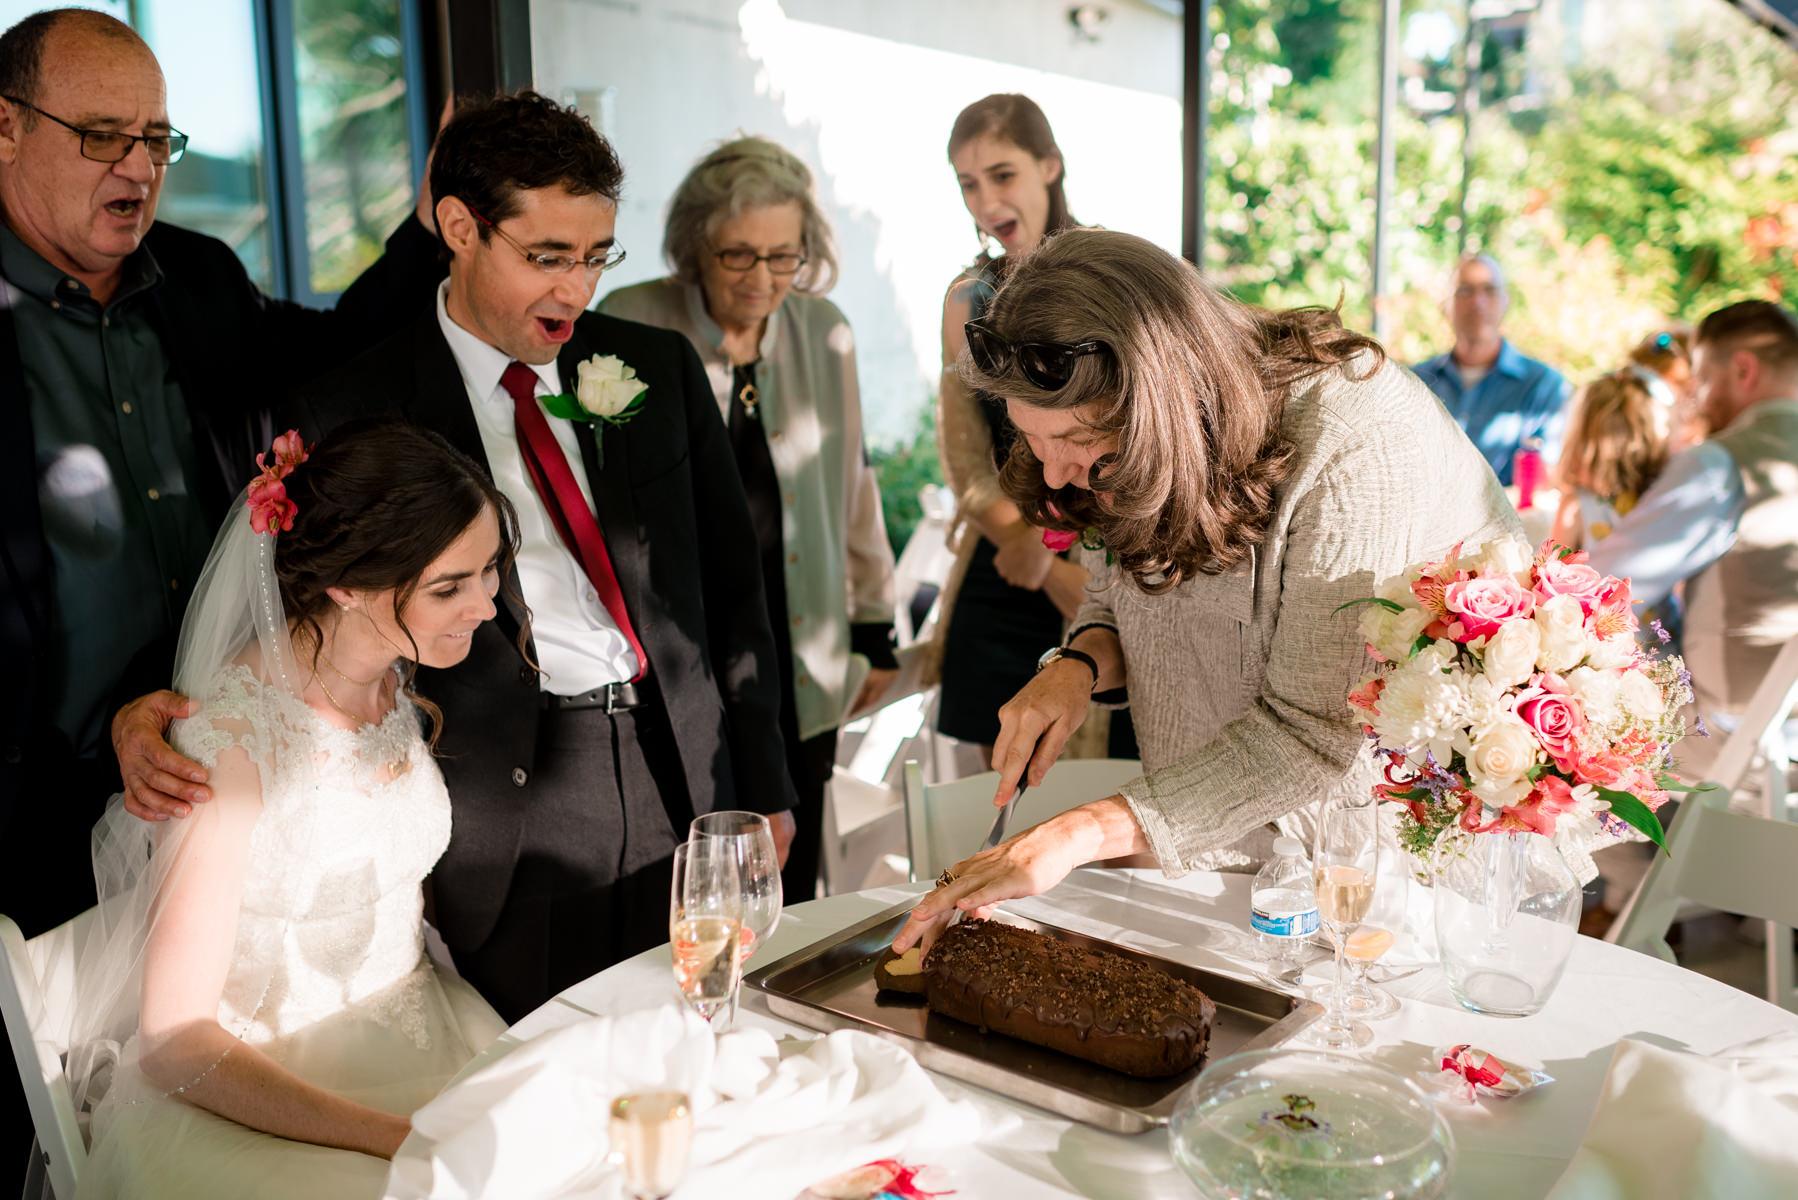 Andrew Tat - Documentary Wedding Photography - Kirkland, Washington - Emily & Cuauh - 34.JPG